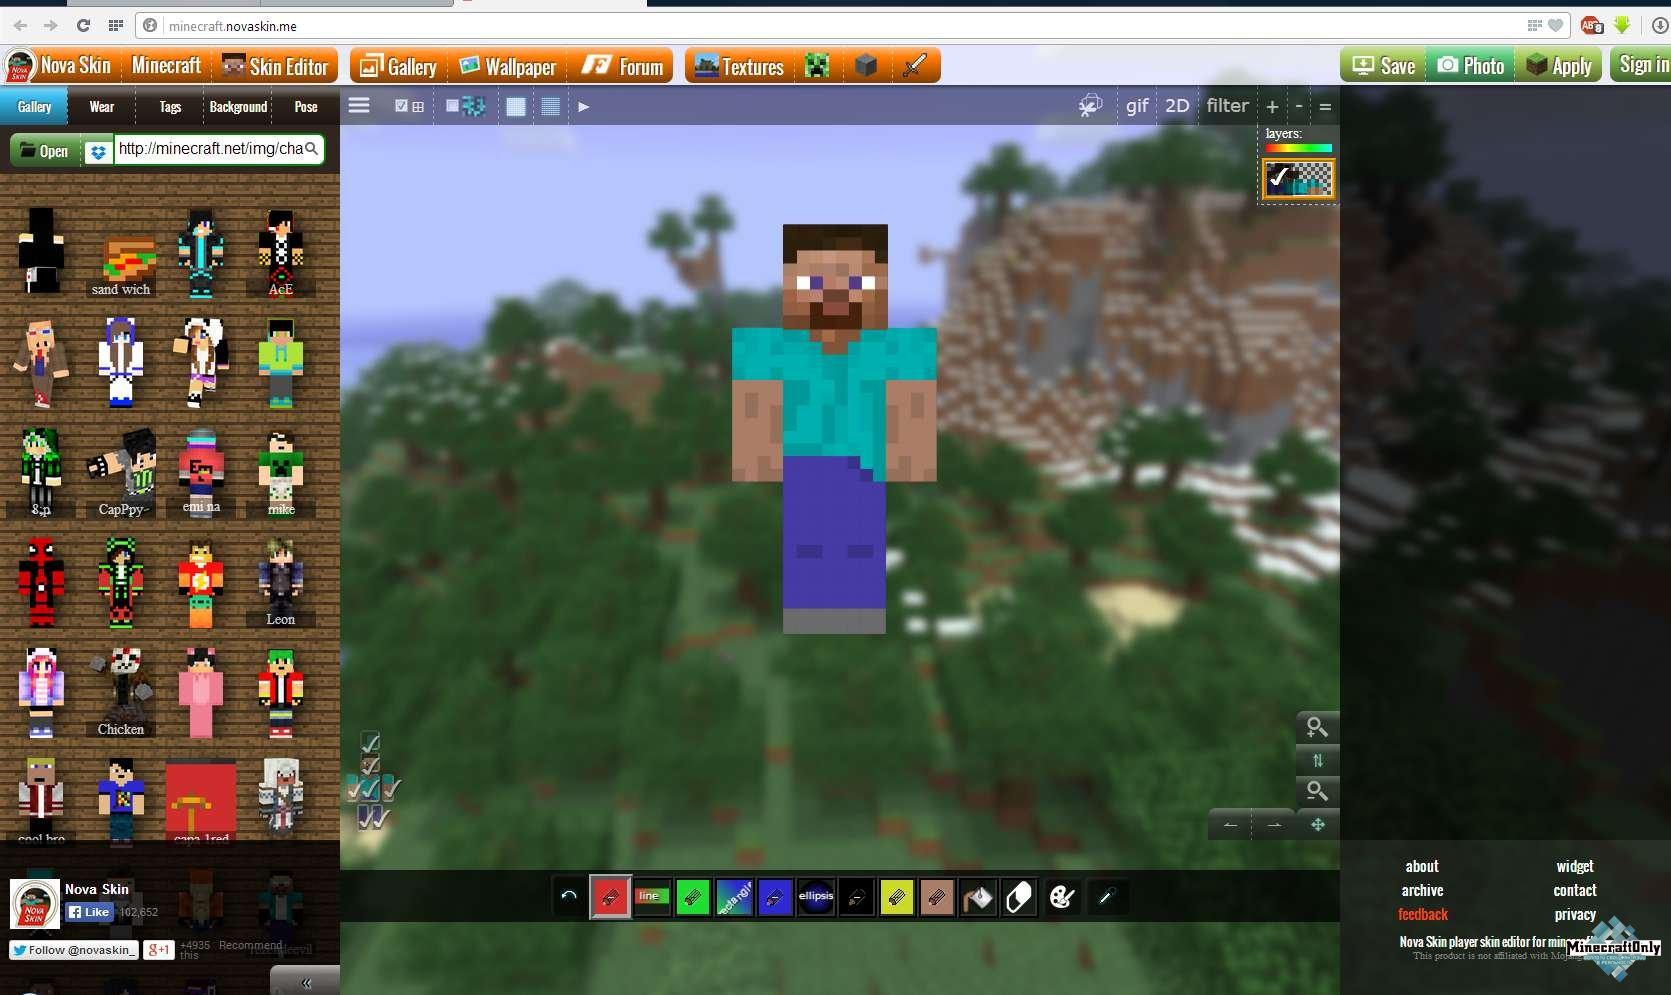 Minecraft: pocket edition - скачать майнкрафт на андроид бесплатно